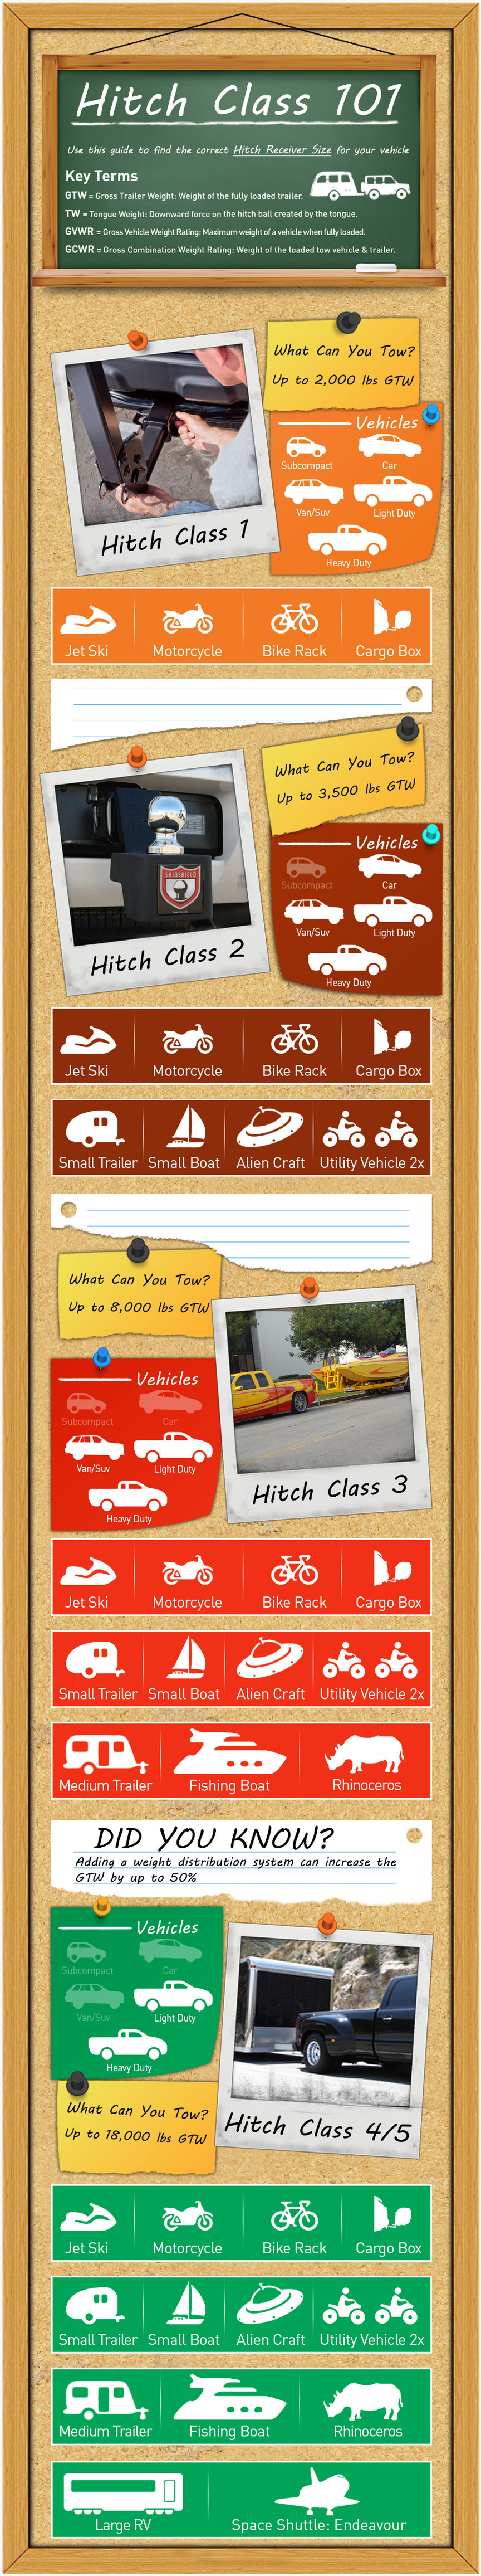 Curt Trailer Hitch Class Guide - Fort Collins, Loveland, Longmont, Colorado